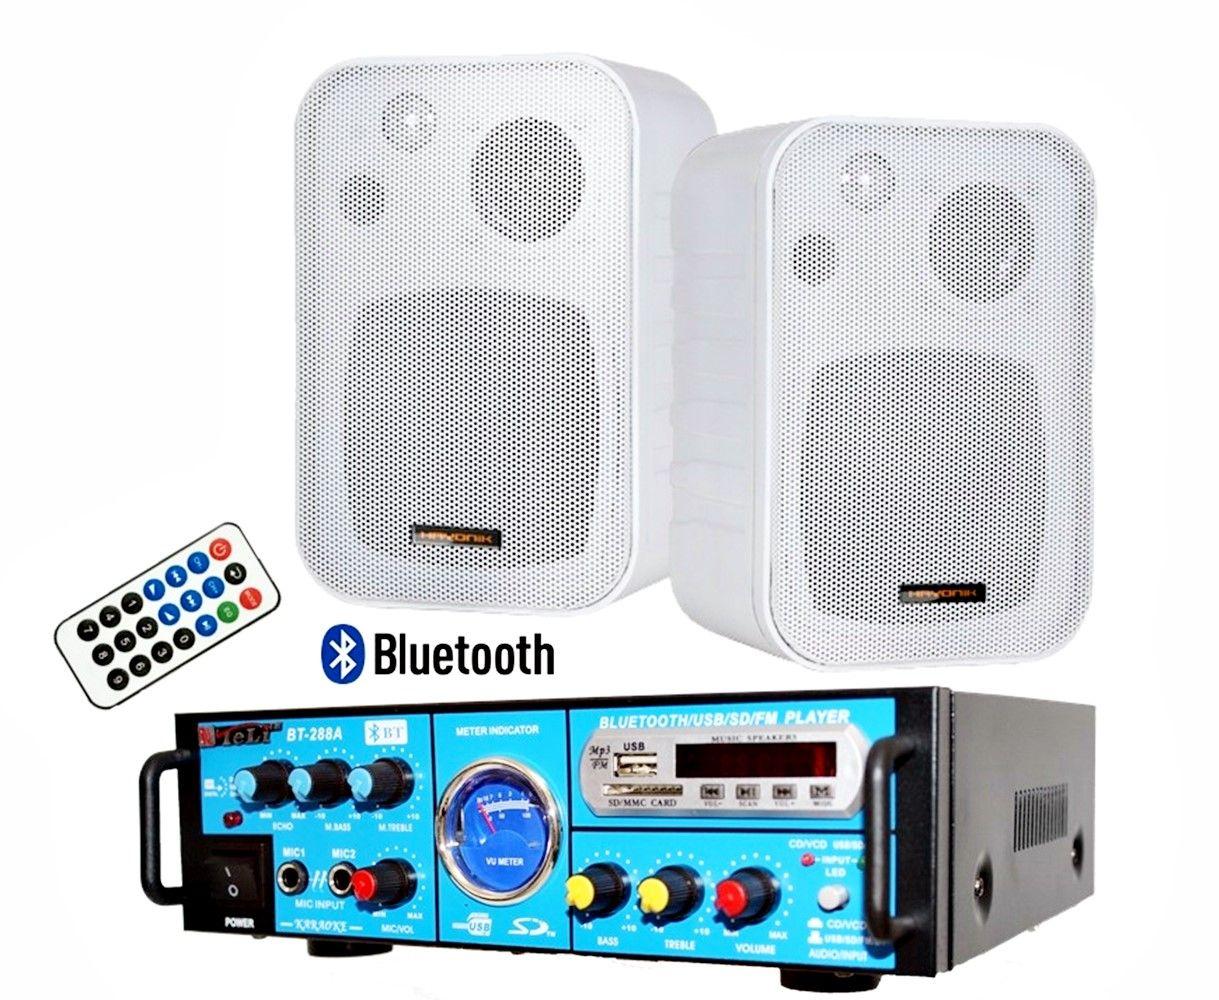 Kit de som ambiente caixas Hayonik branca 3 vias amplificador com Bluetooth kit-E3